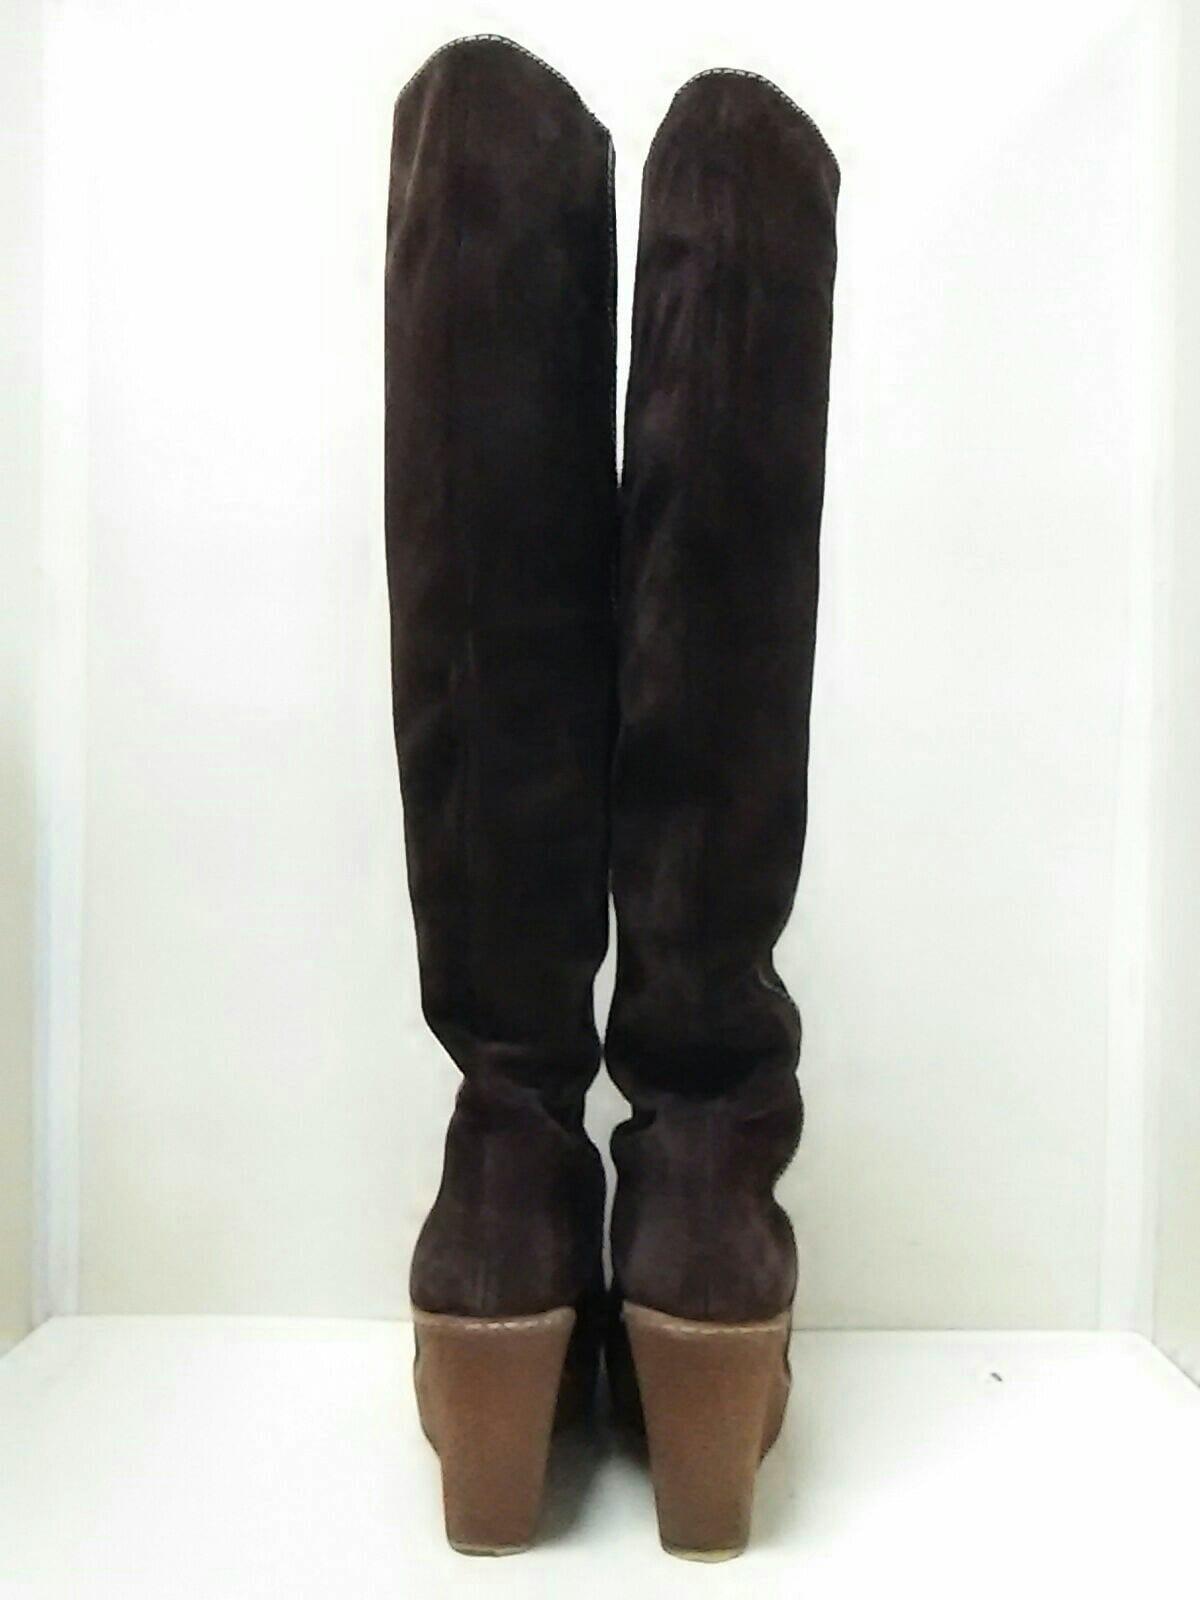 PONS QUINTANA(ポンスキンタナ)のブーツ